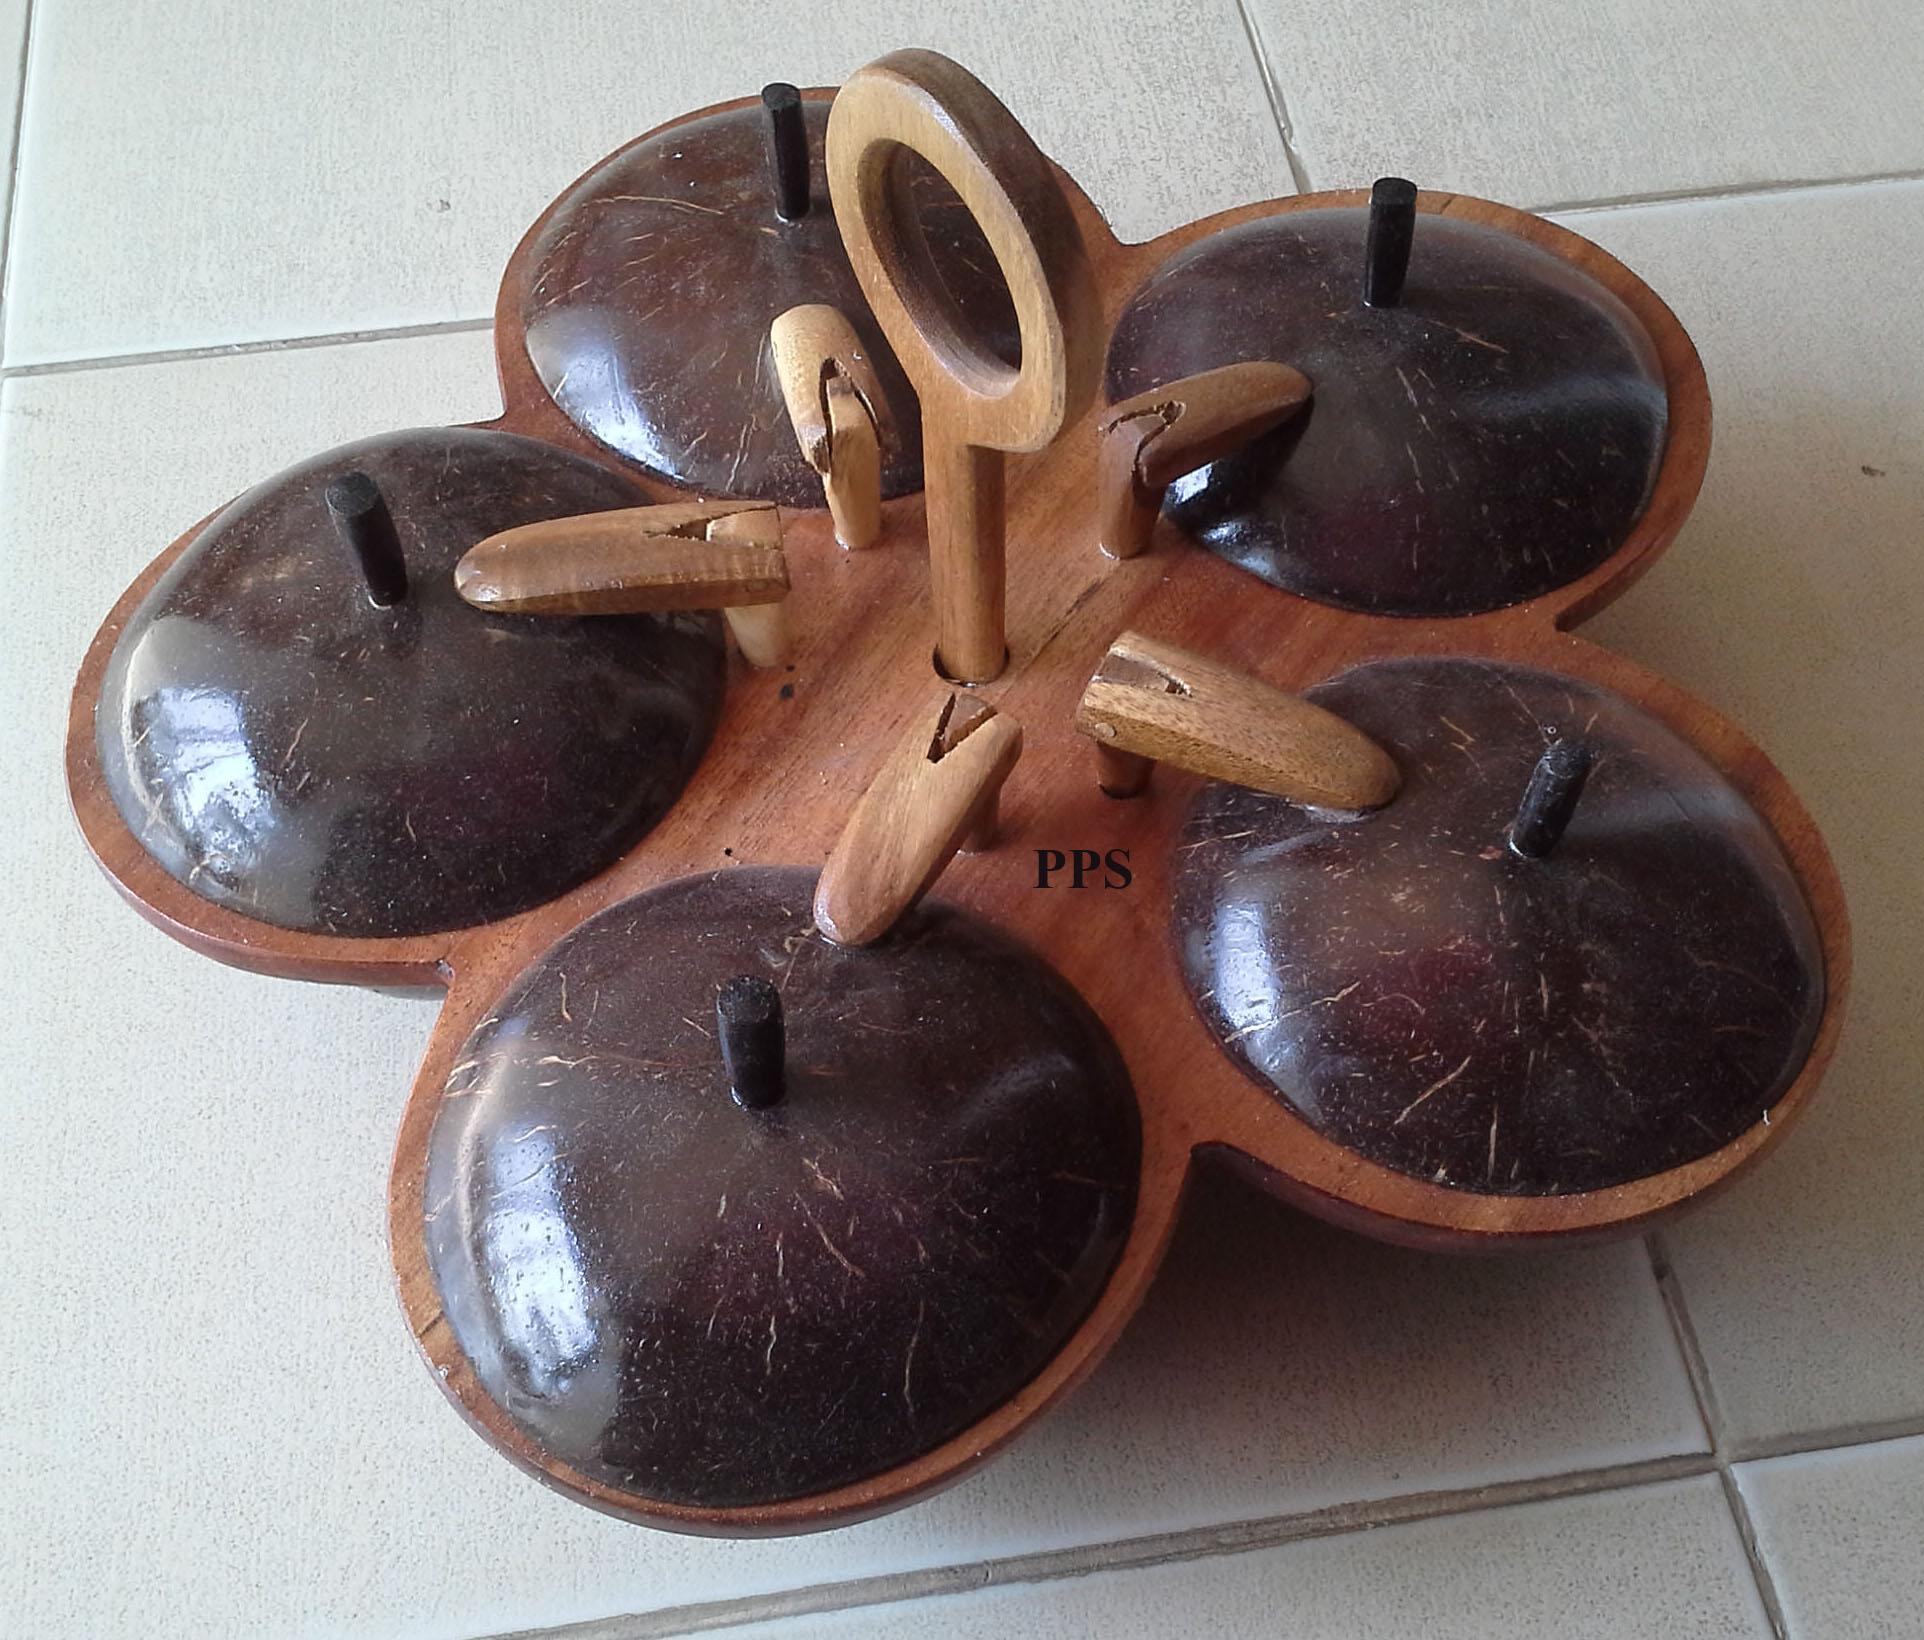 Coconut ingredient bowl set-CC-0110